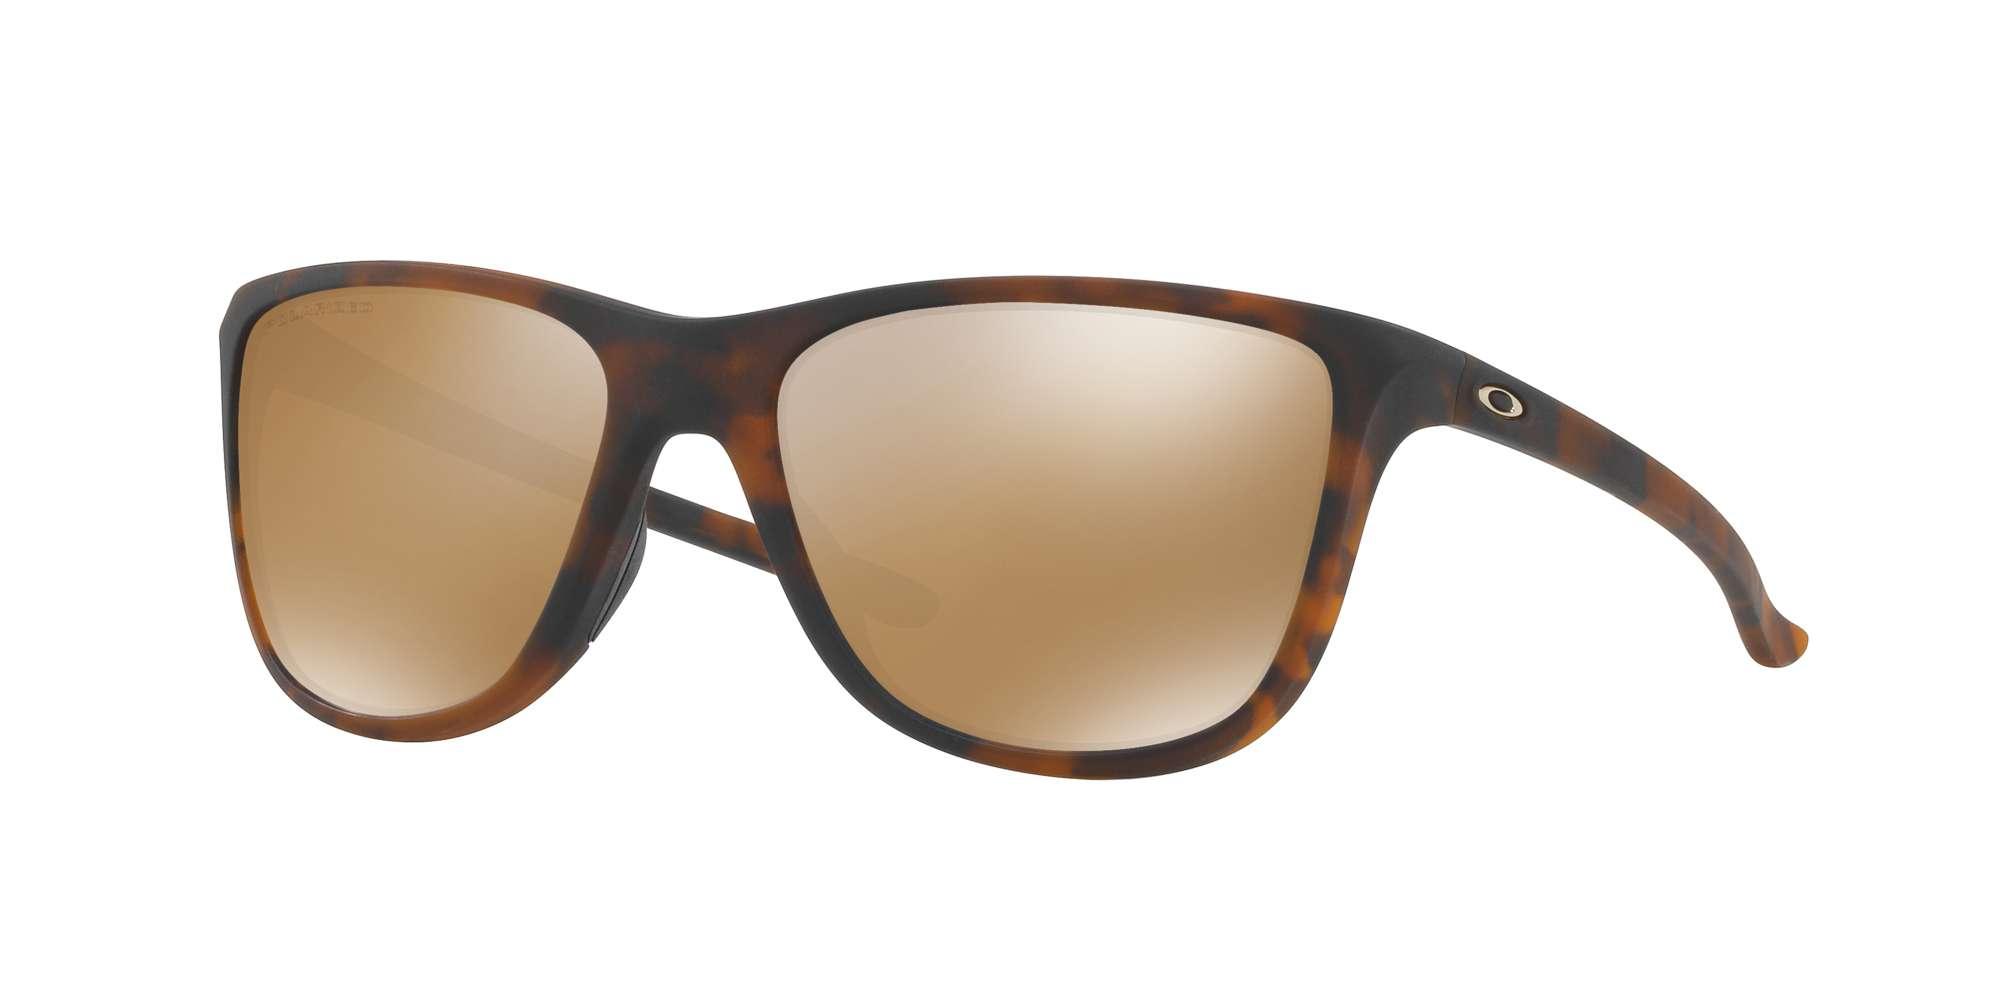 MATTE BROWN TORTOISE / TUNGSTEN IRIDIUM POLARIZED lenses